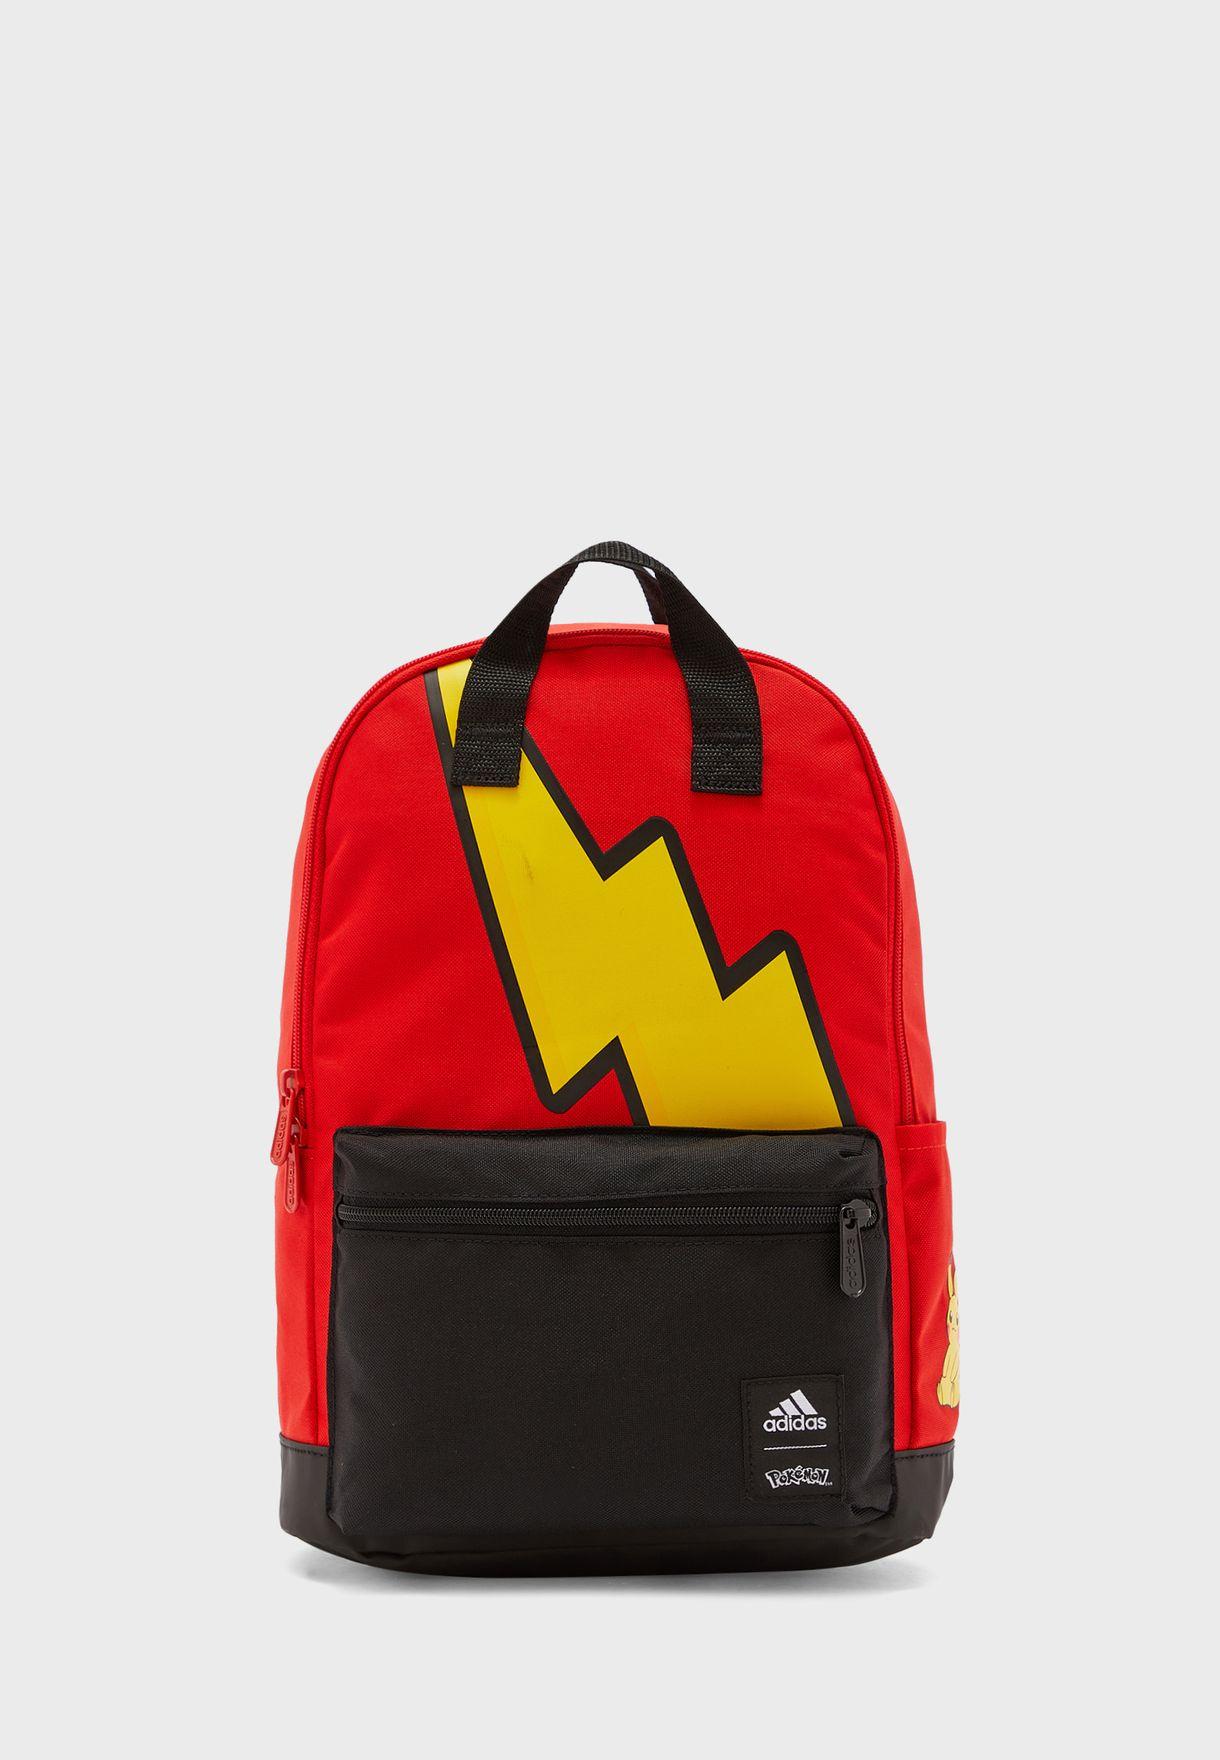 Pokémon Classic Sports Unisex Backpack